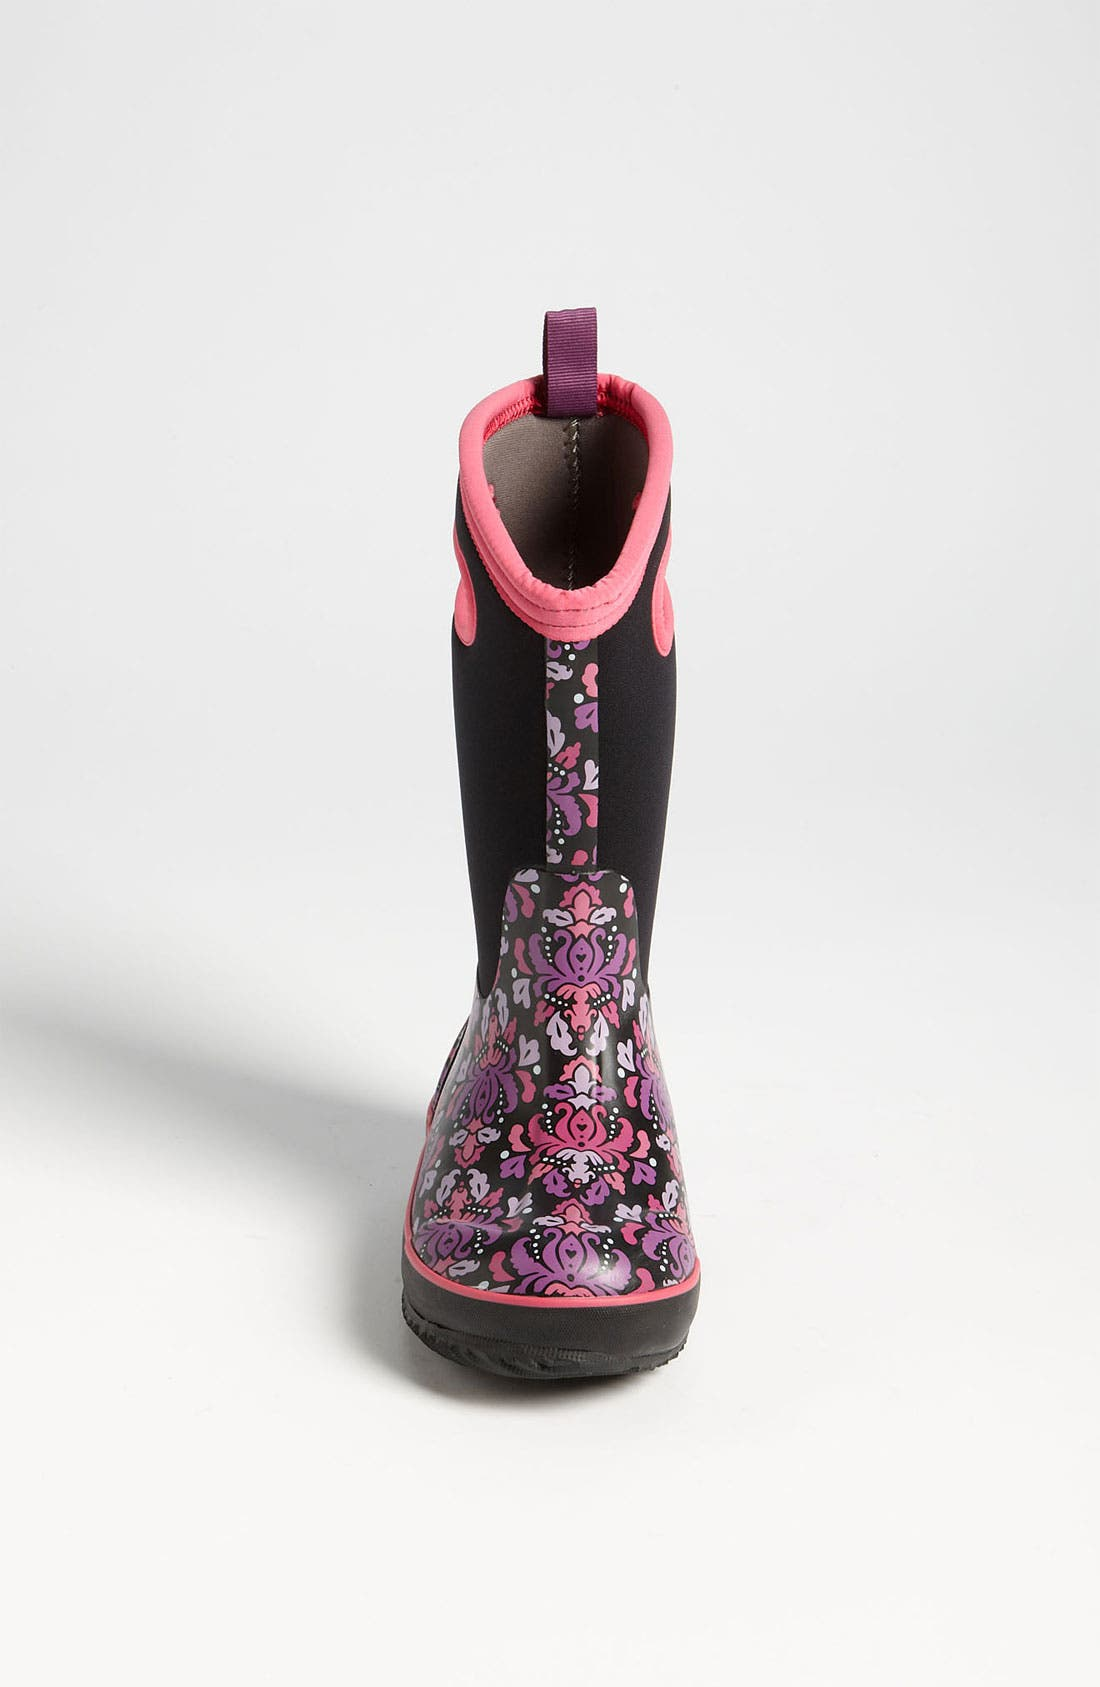 Alternate Image 3  - Bogs 'Classic High - Fleur' Waterproof Boot (Toddler, Little Kid & Big Kid) (Nordstrom Exclusive)